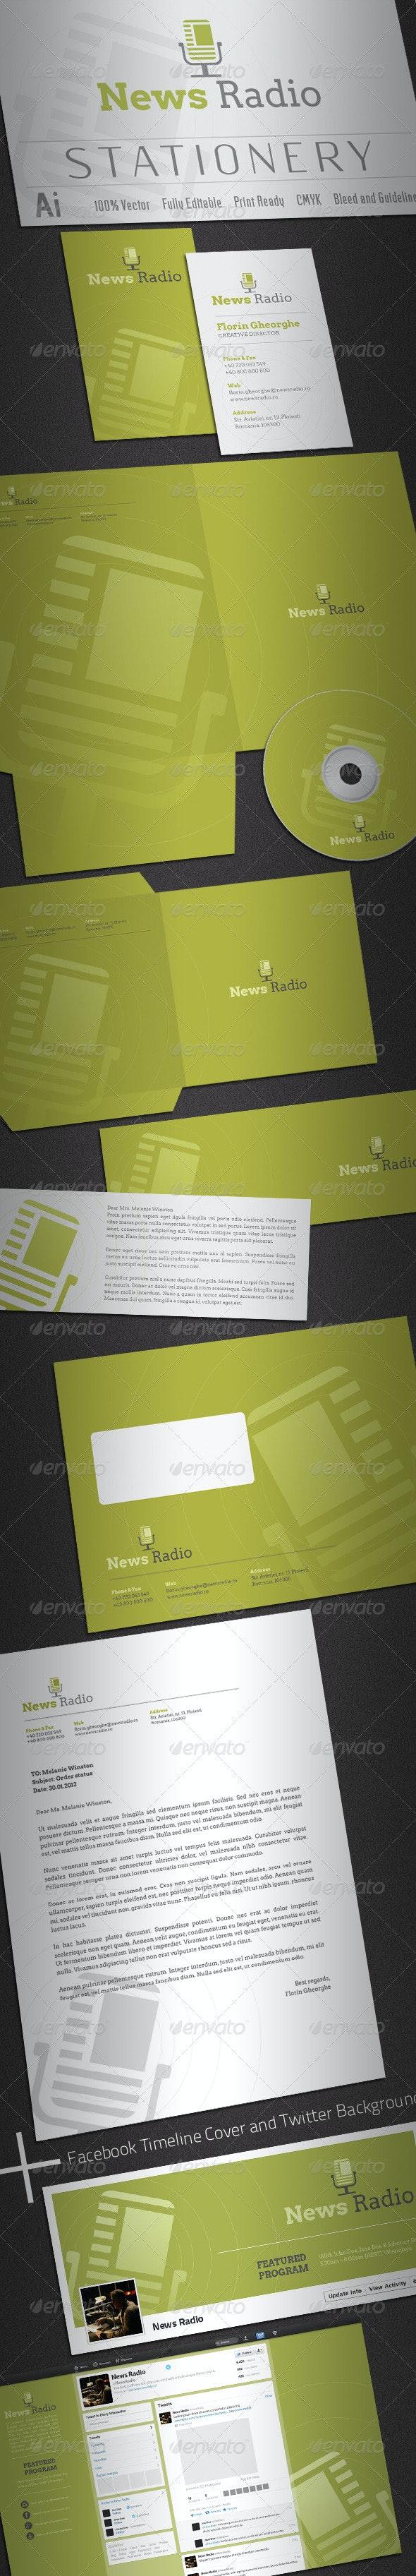 News Radio Stationery - Stationery Print Templates